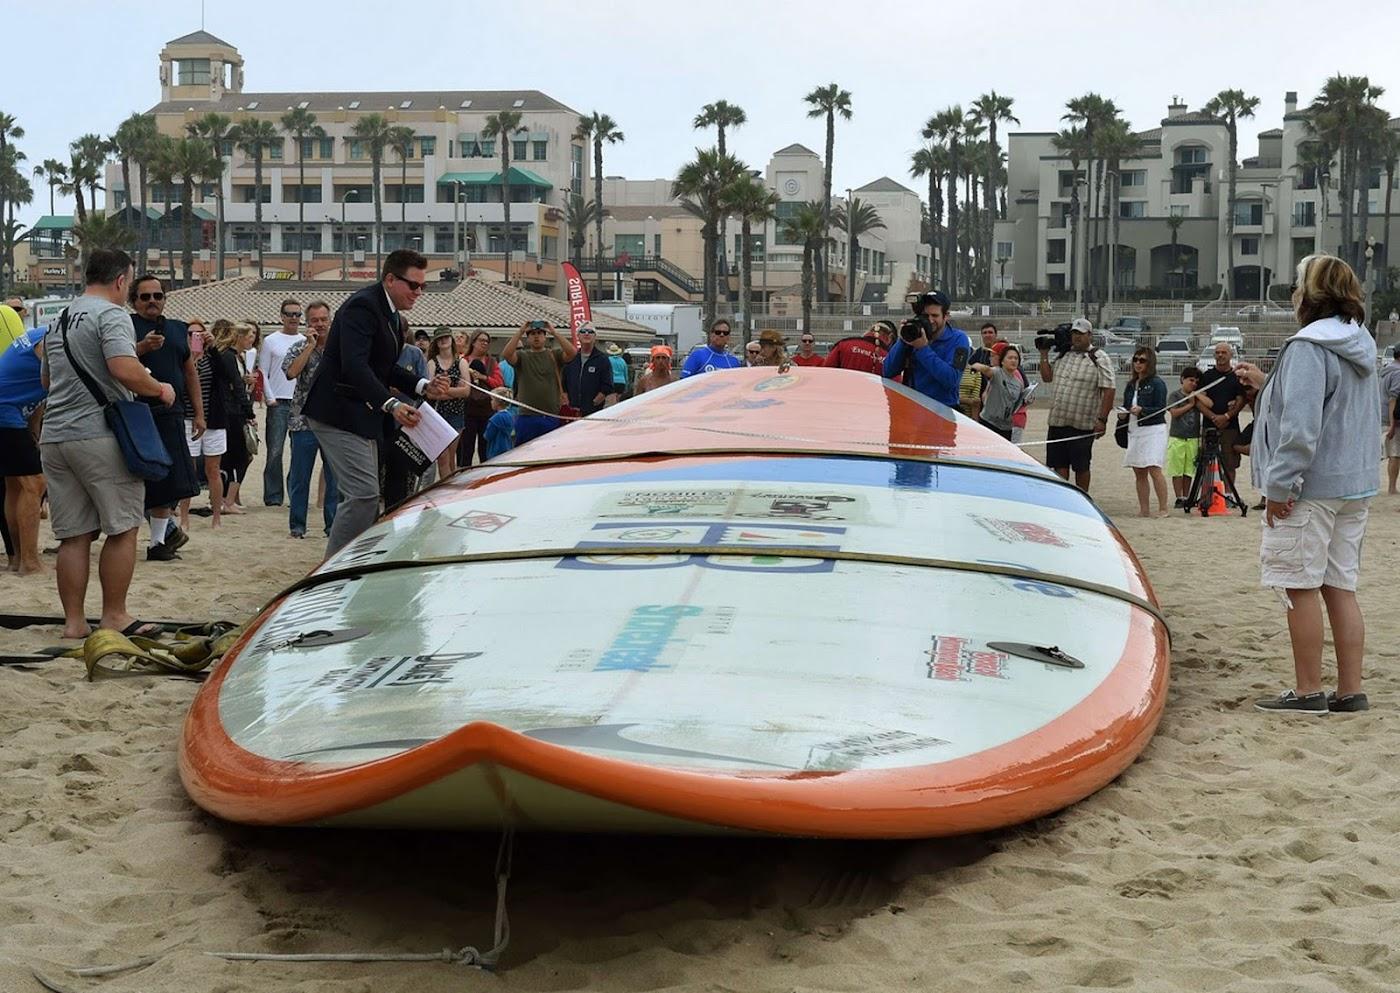 Worlds largest surfboard 06